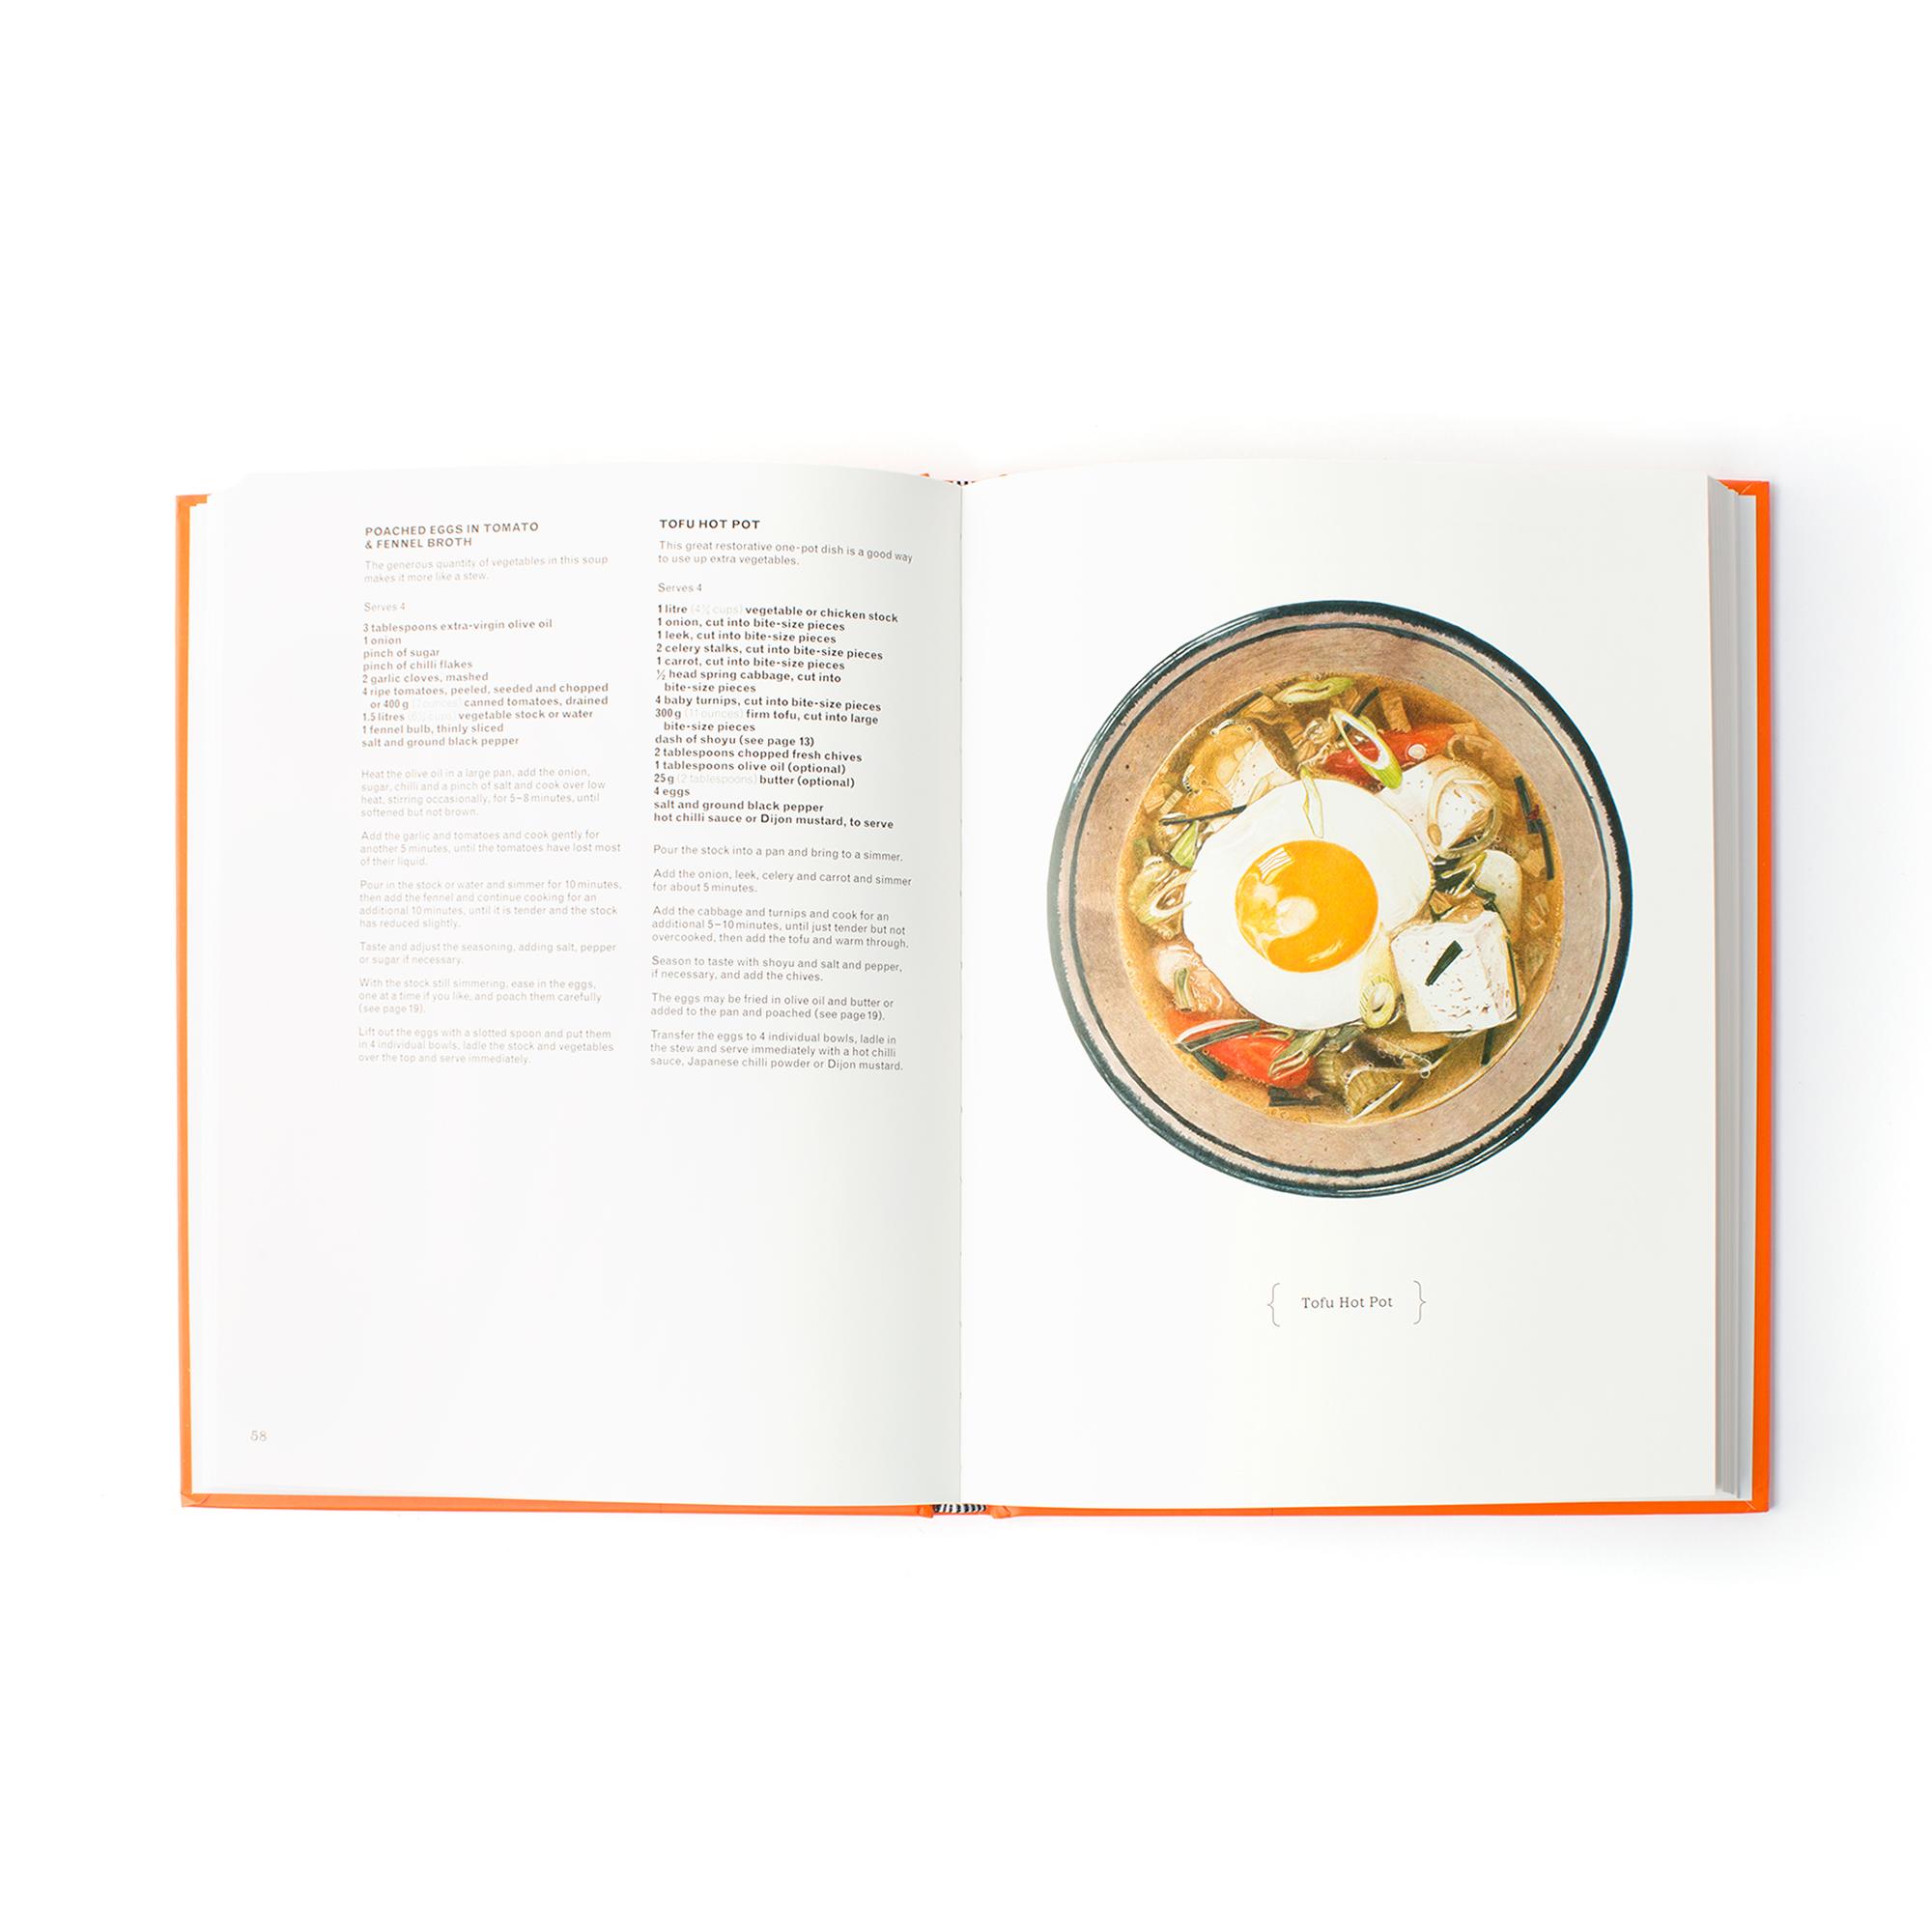 Add The Eggs Hard Boiled